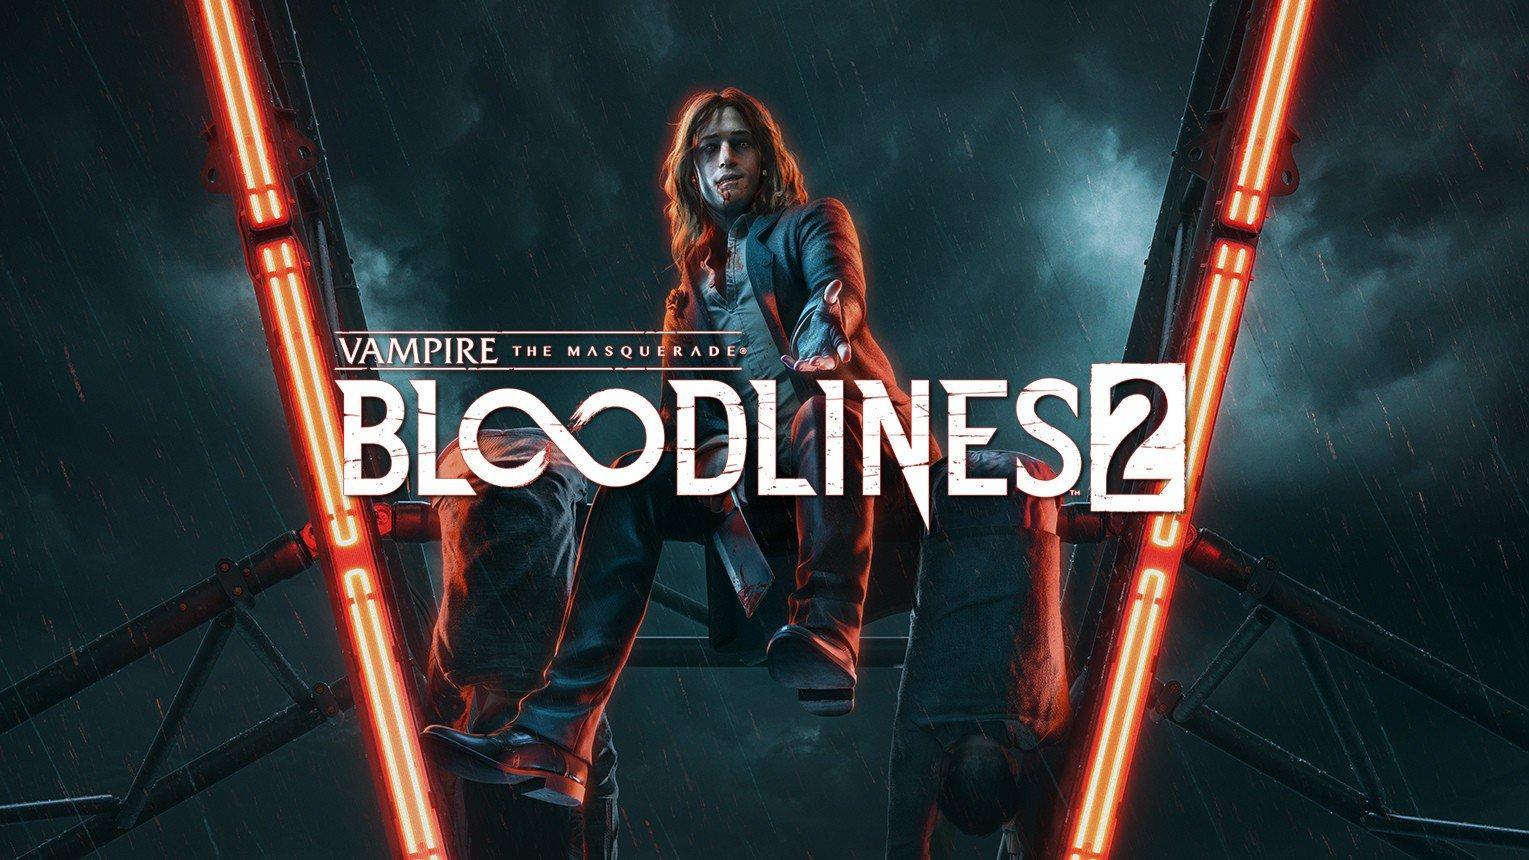 Vtm Bloodlines 2 Game Wallpapers Wallpaper Cave